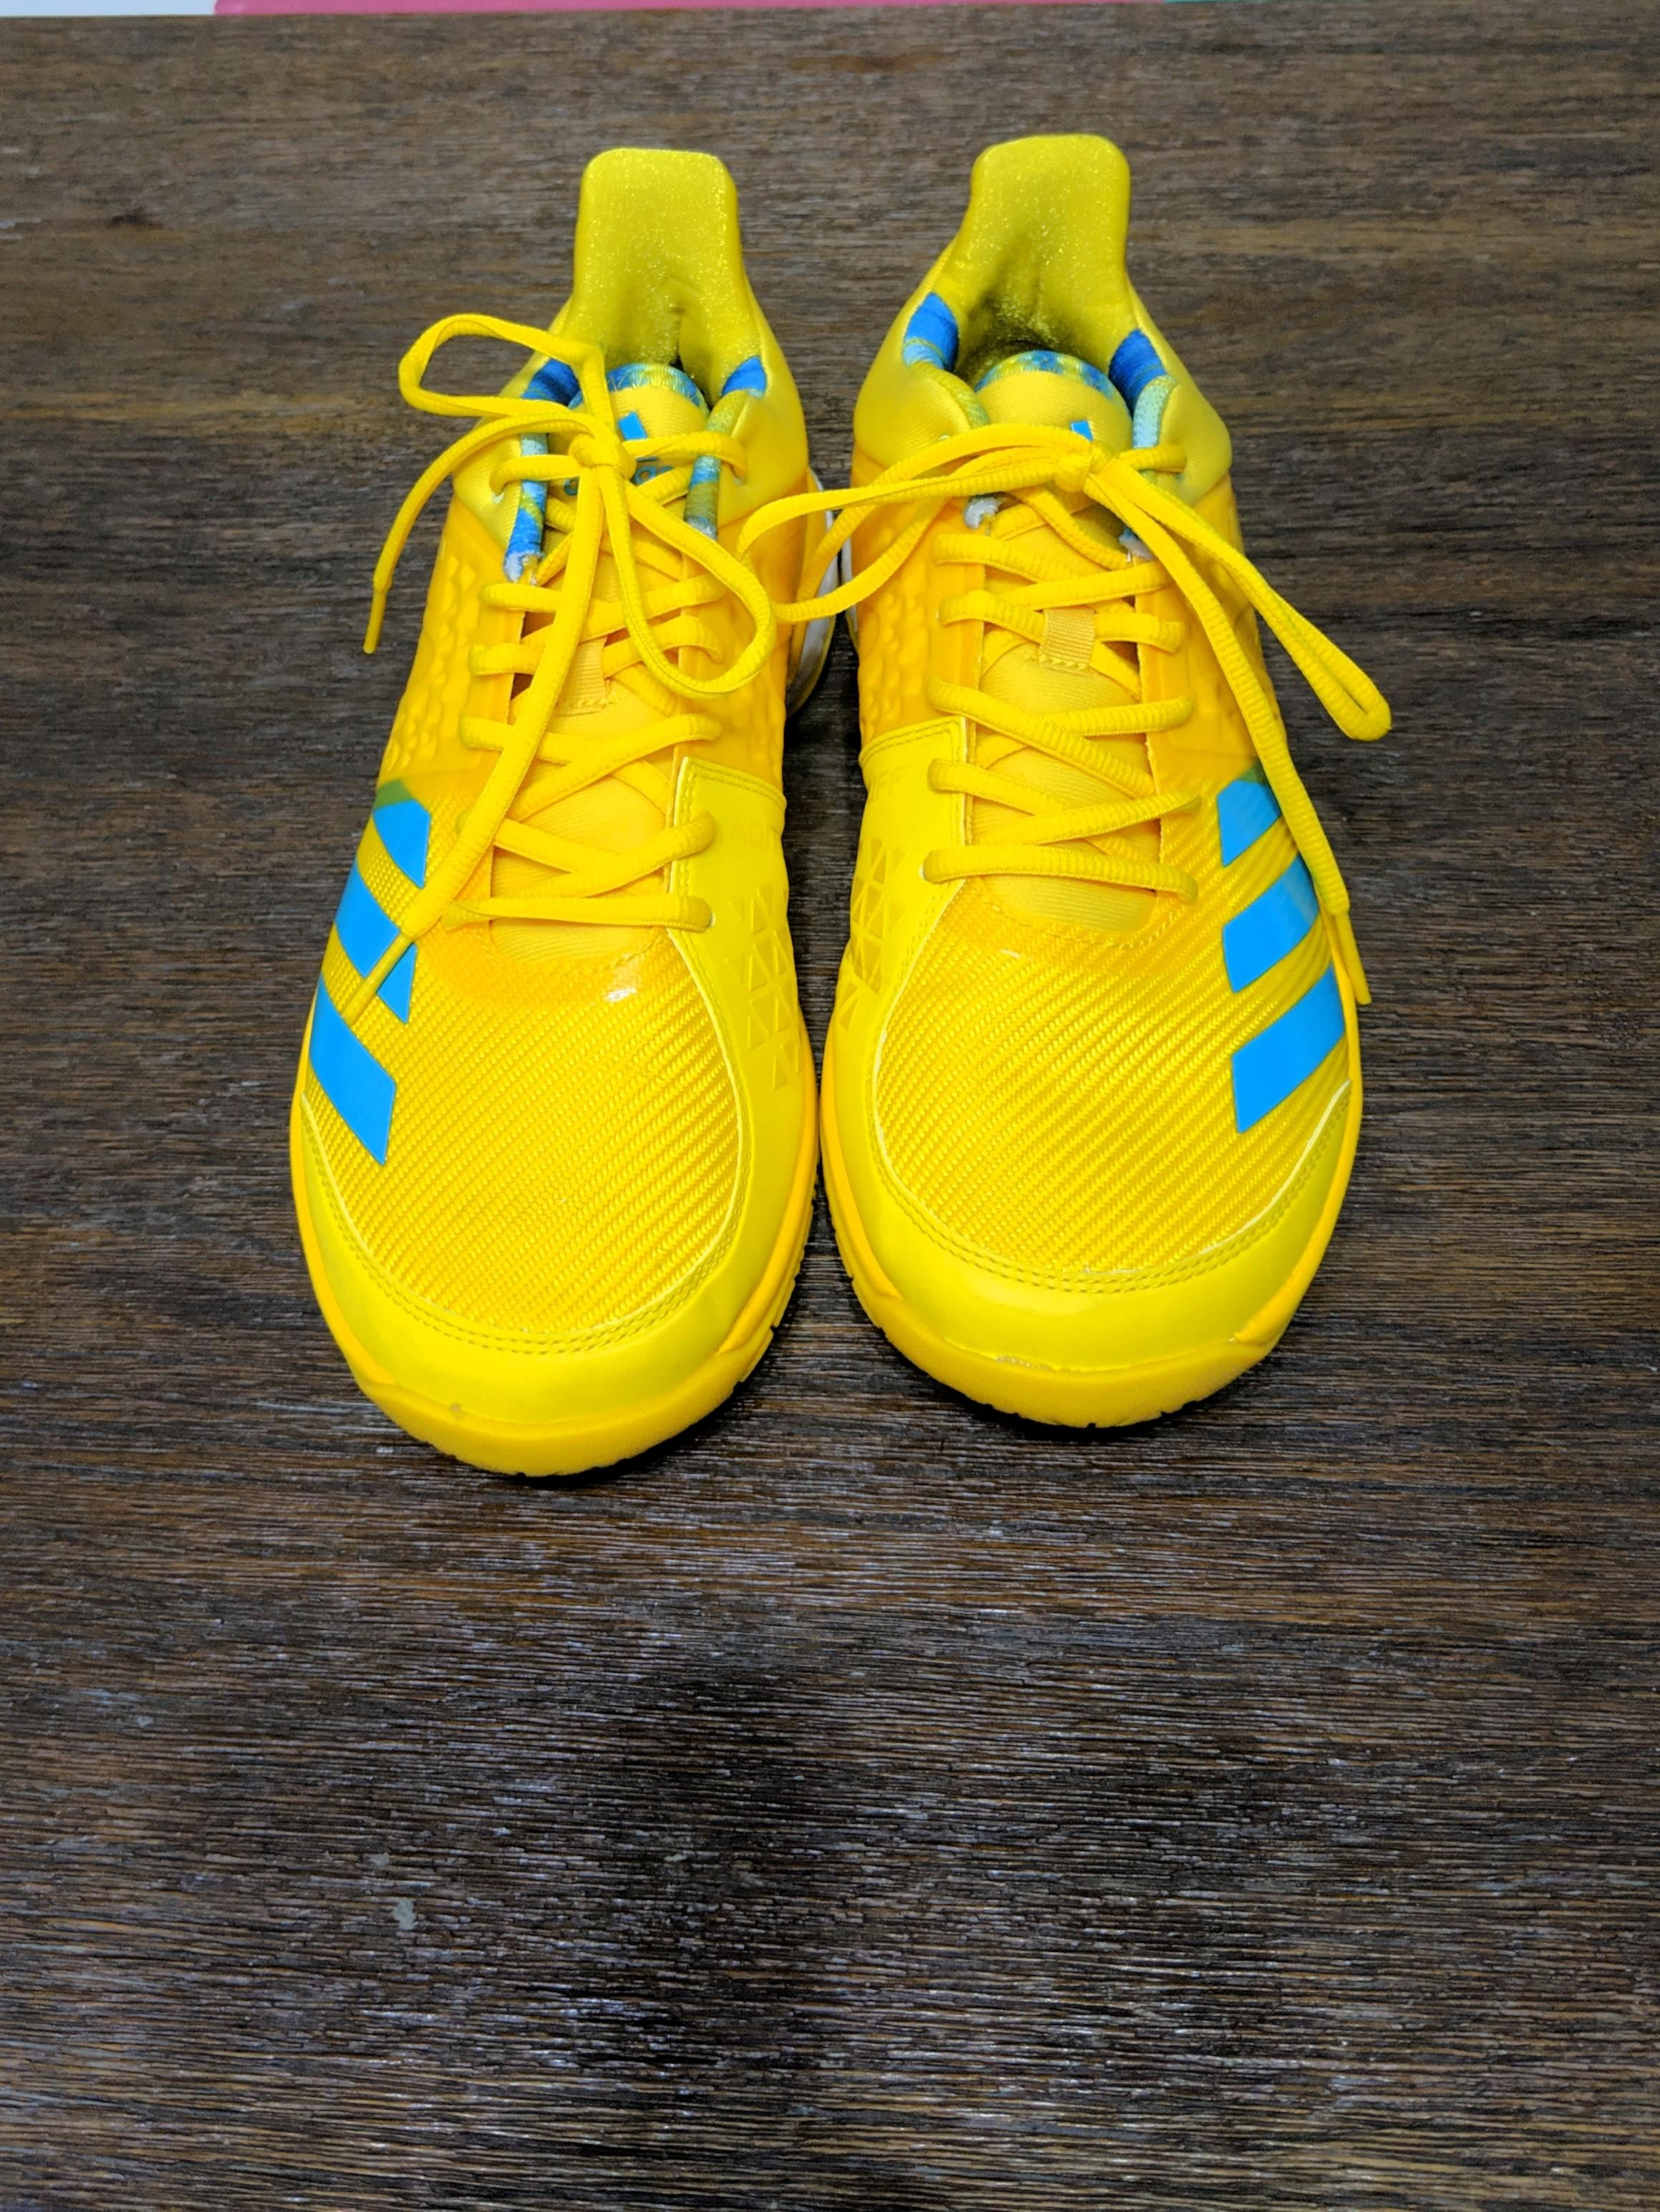 Adidas Wucht P8 badminton shoes US8.5